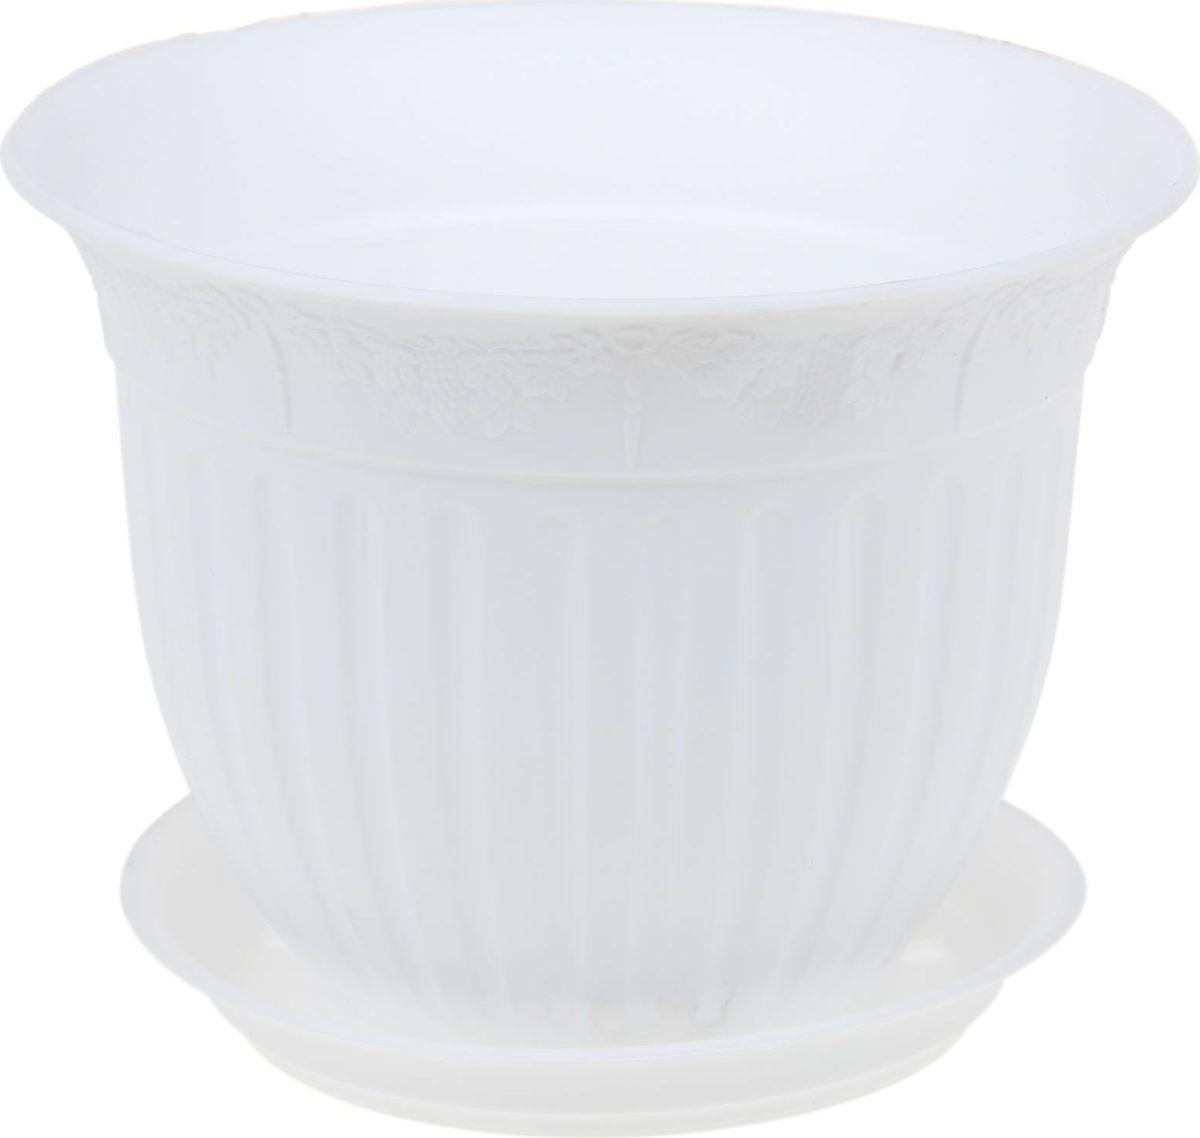 Кашпо JetPlast Виноград, с поддоном, цвет: белый, 4 л